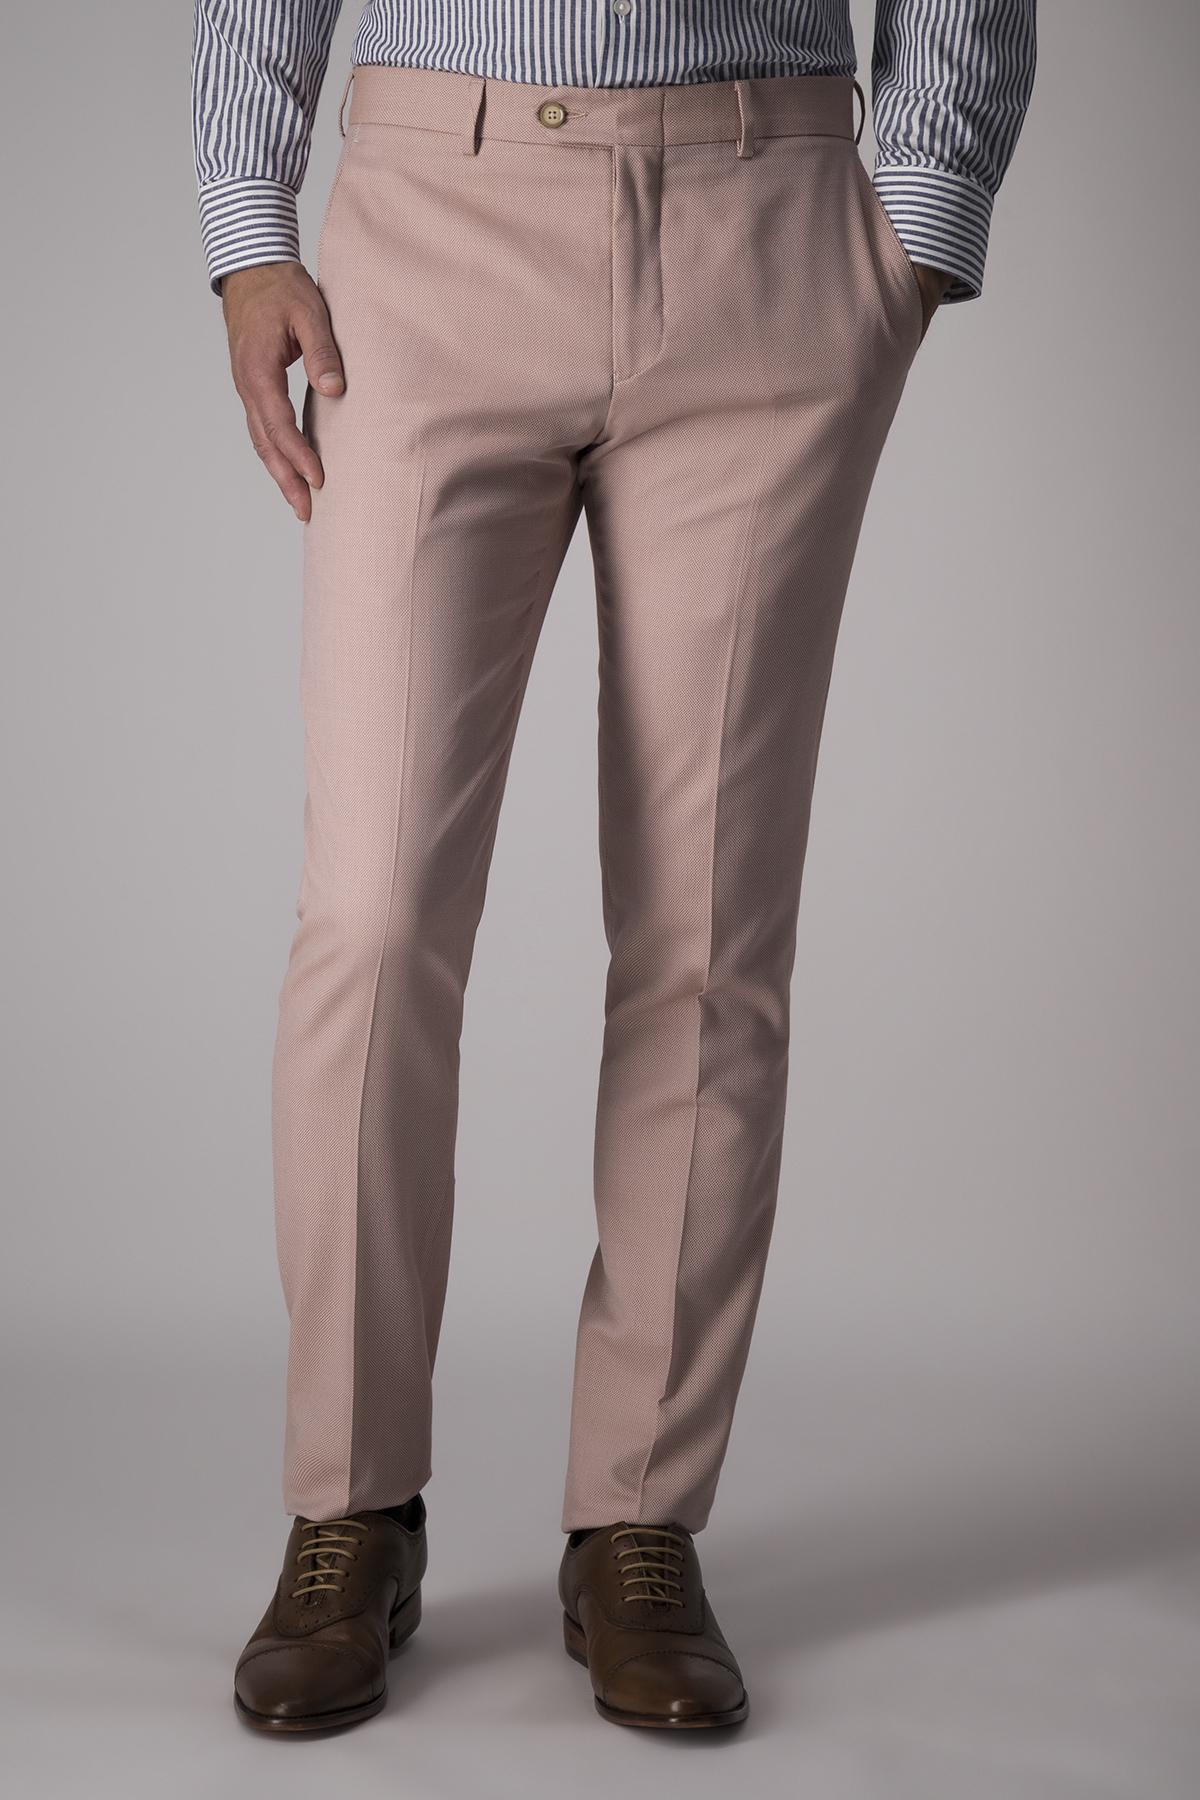 Pantalón Robert´s, lana y algodón, slim, color naranja.